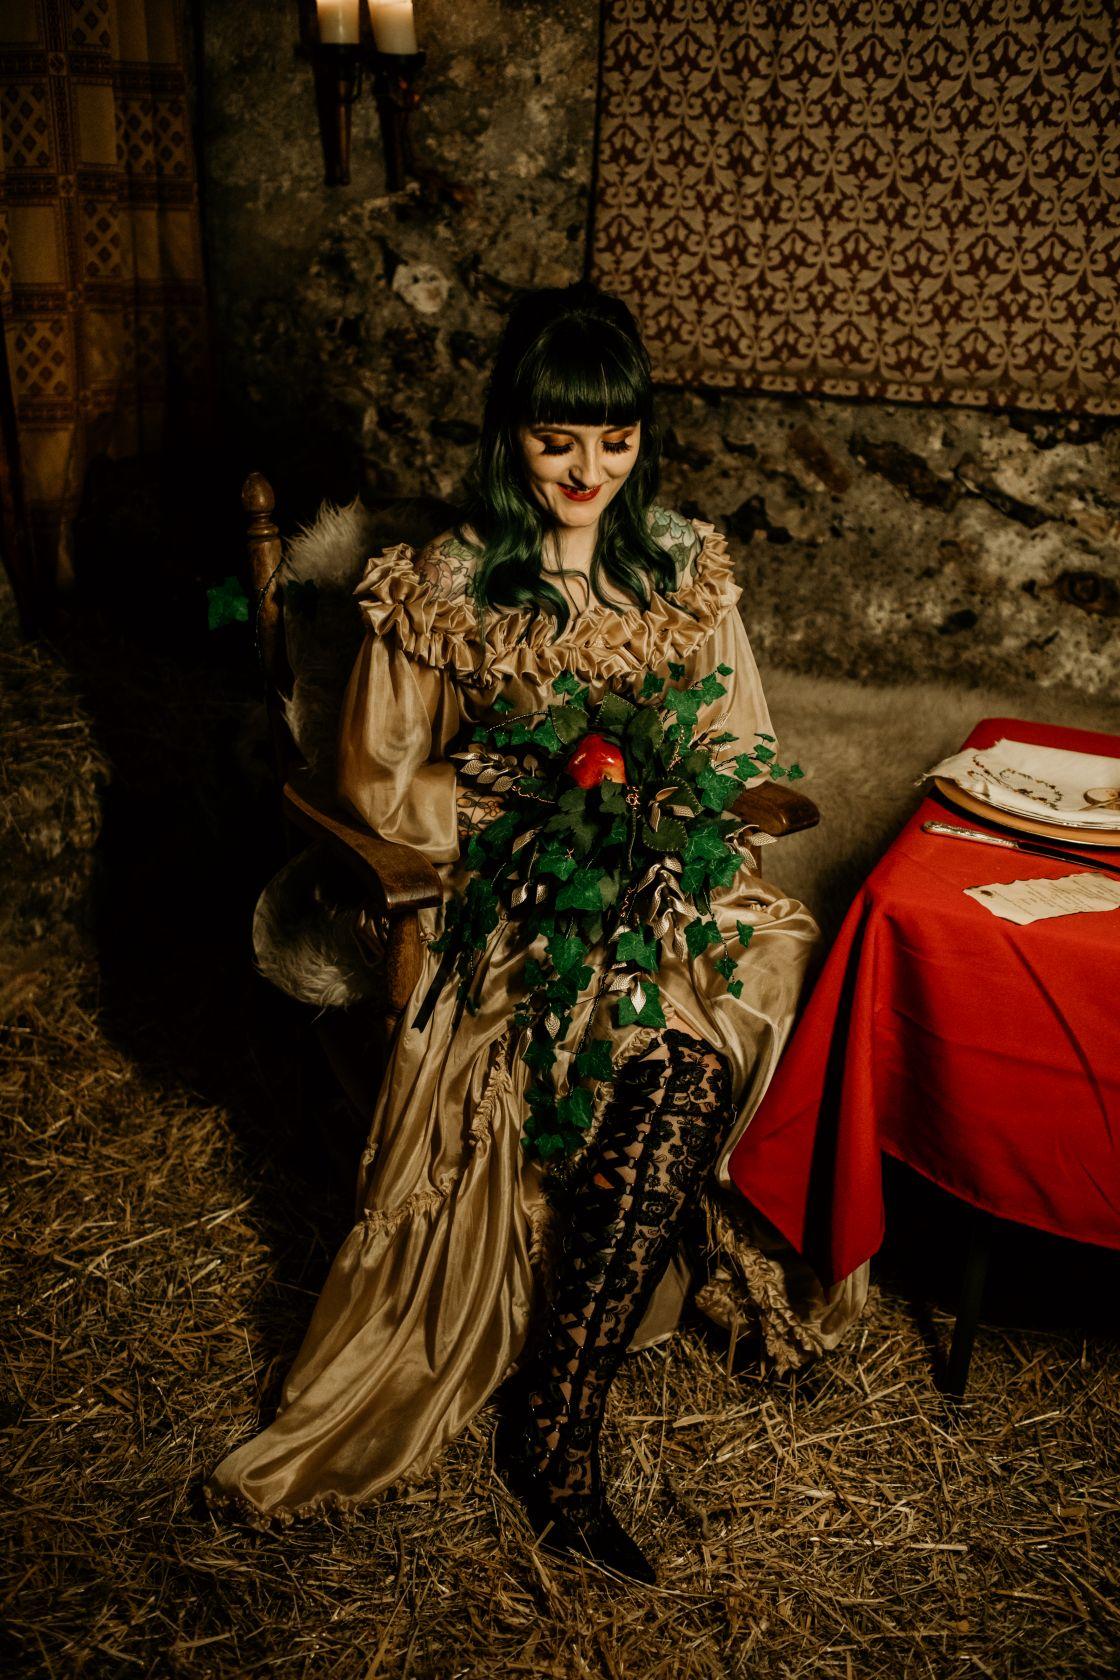 alternative fairytale wedding- snow white wedding- charlotte laurie designs-chloe mary photo- unconventional wedding- alternative wedding inspiration- alternative bridal look